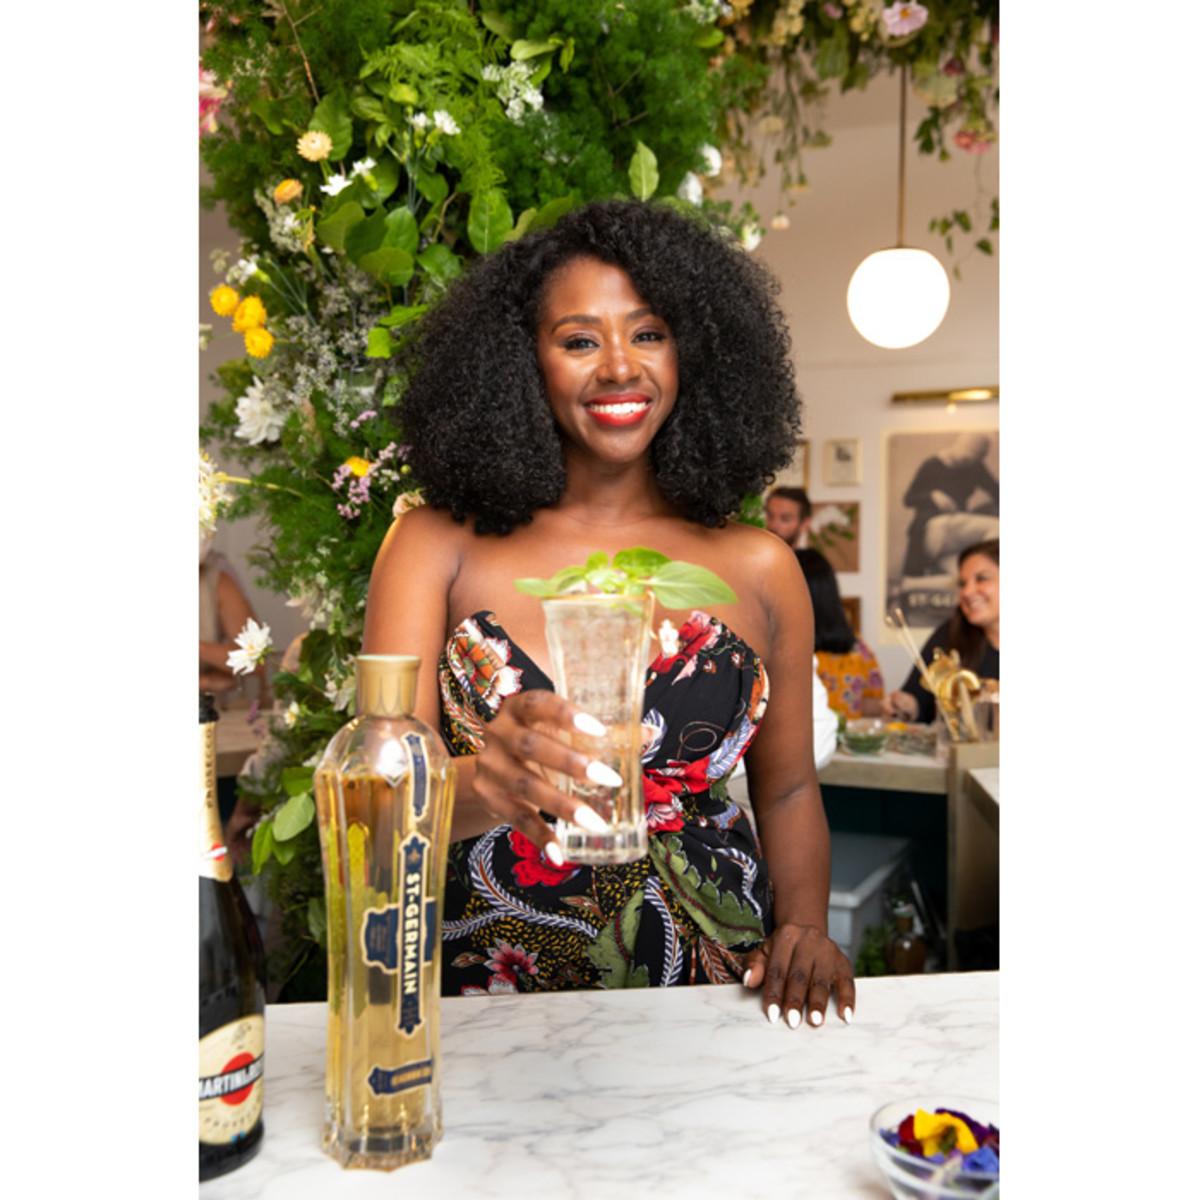 St-Germain national brand ambassador Earlecia Richelle created four cocktails for the Fleuriste St-Germain pop-up